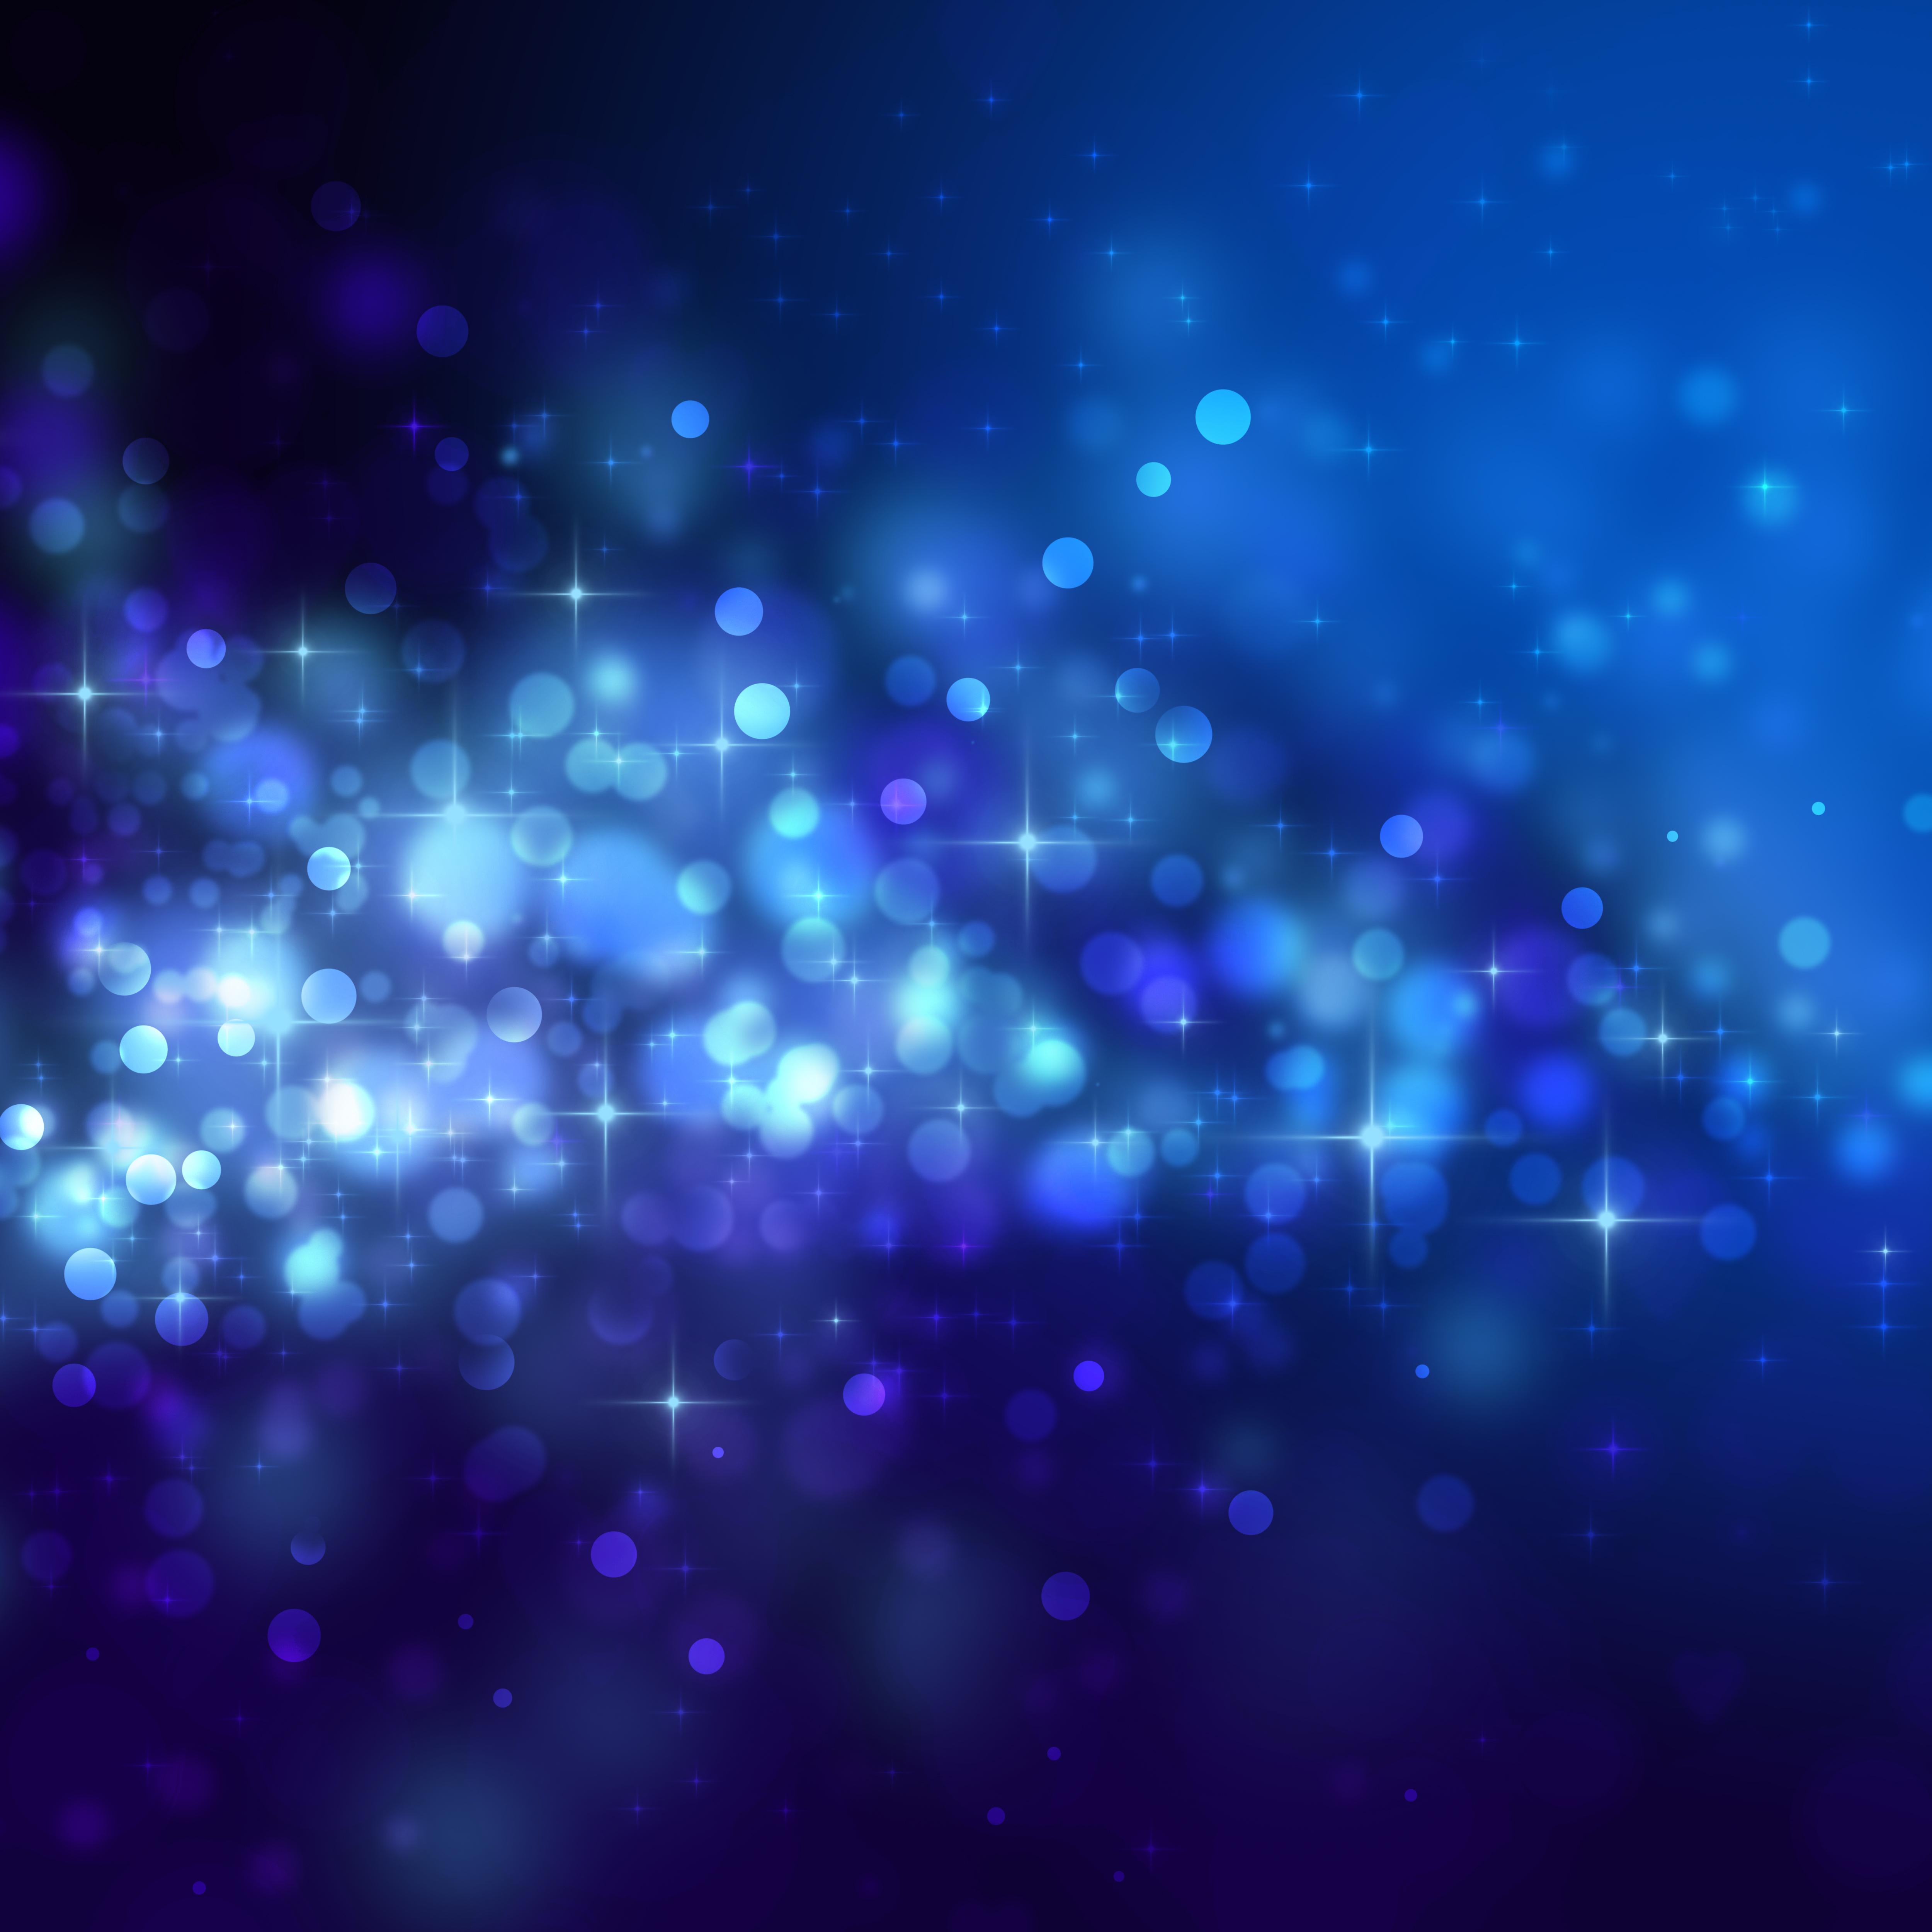 Sparkle blue background